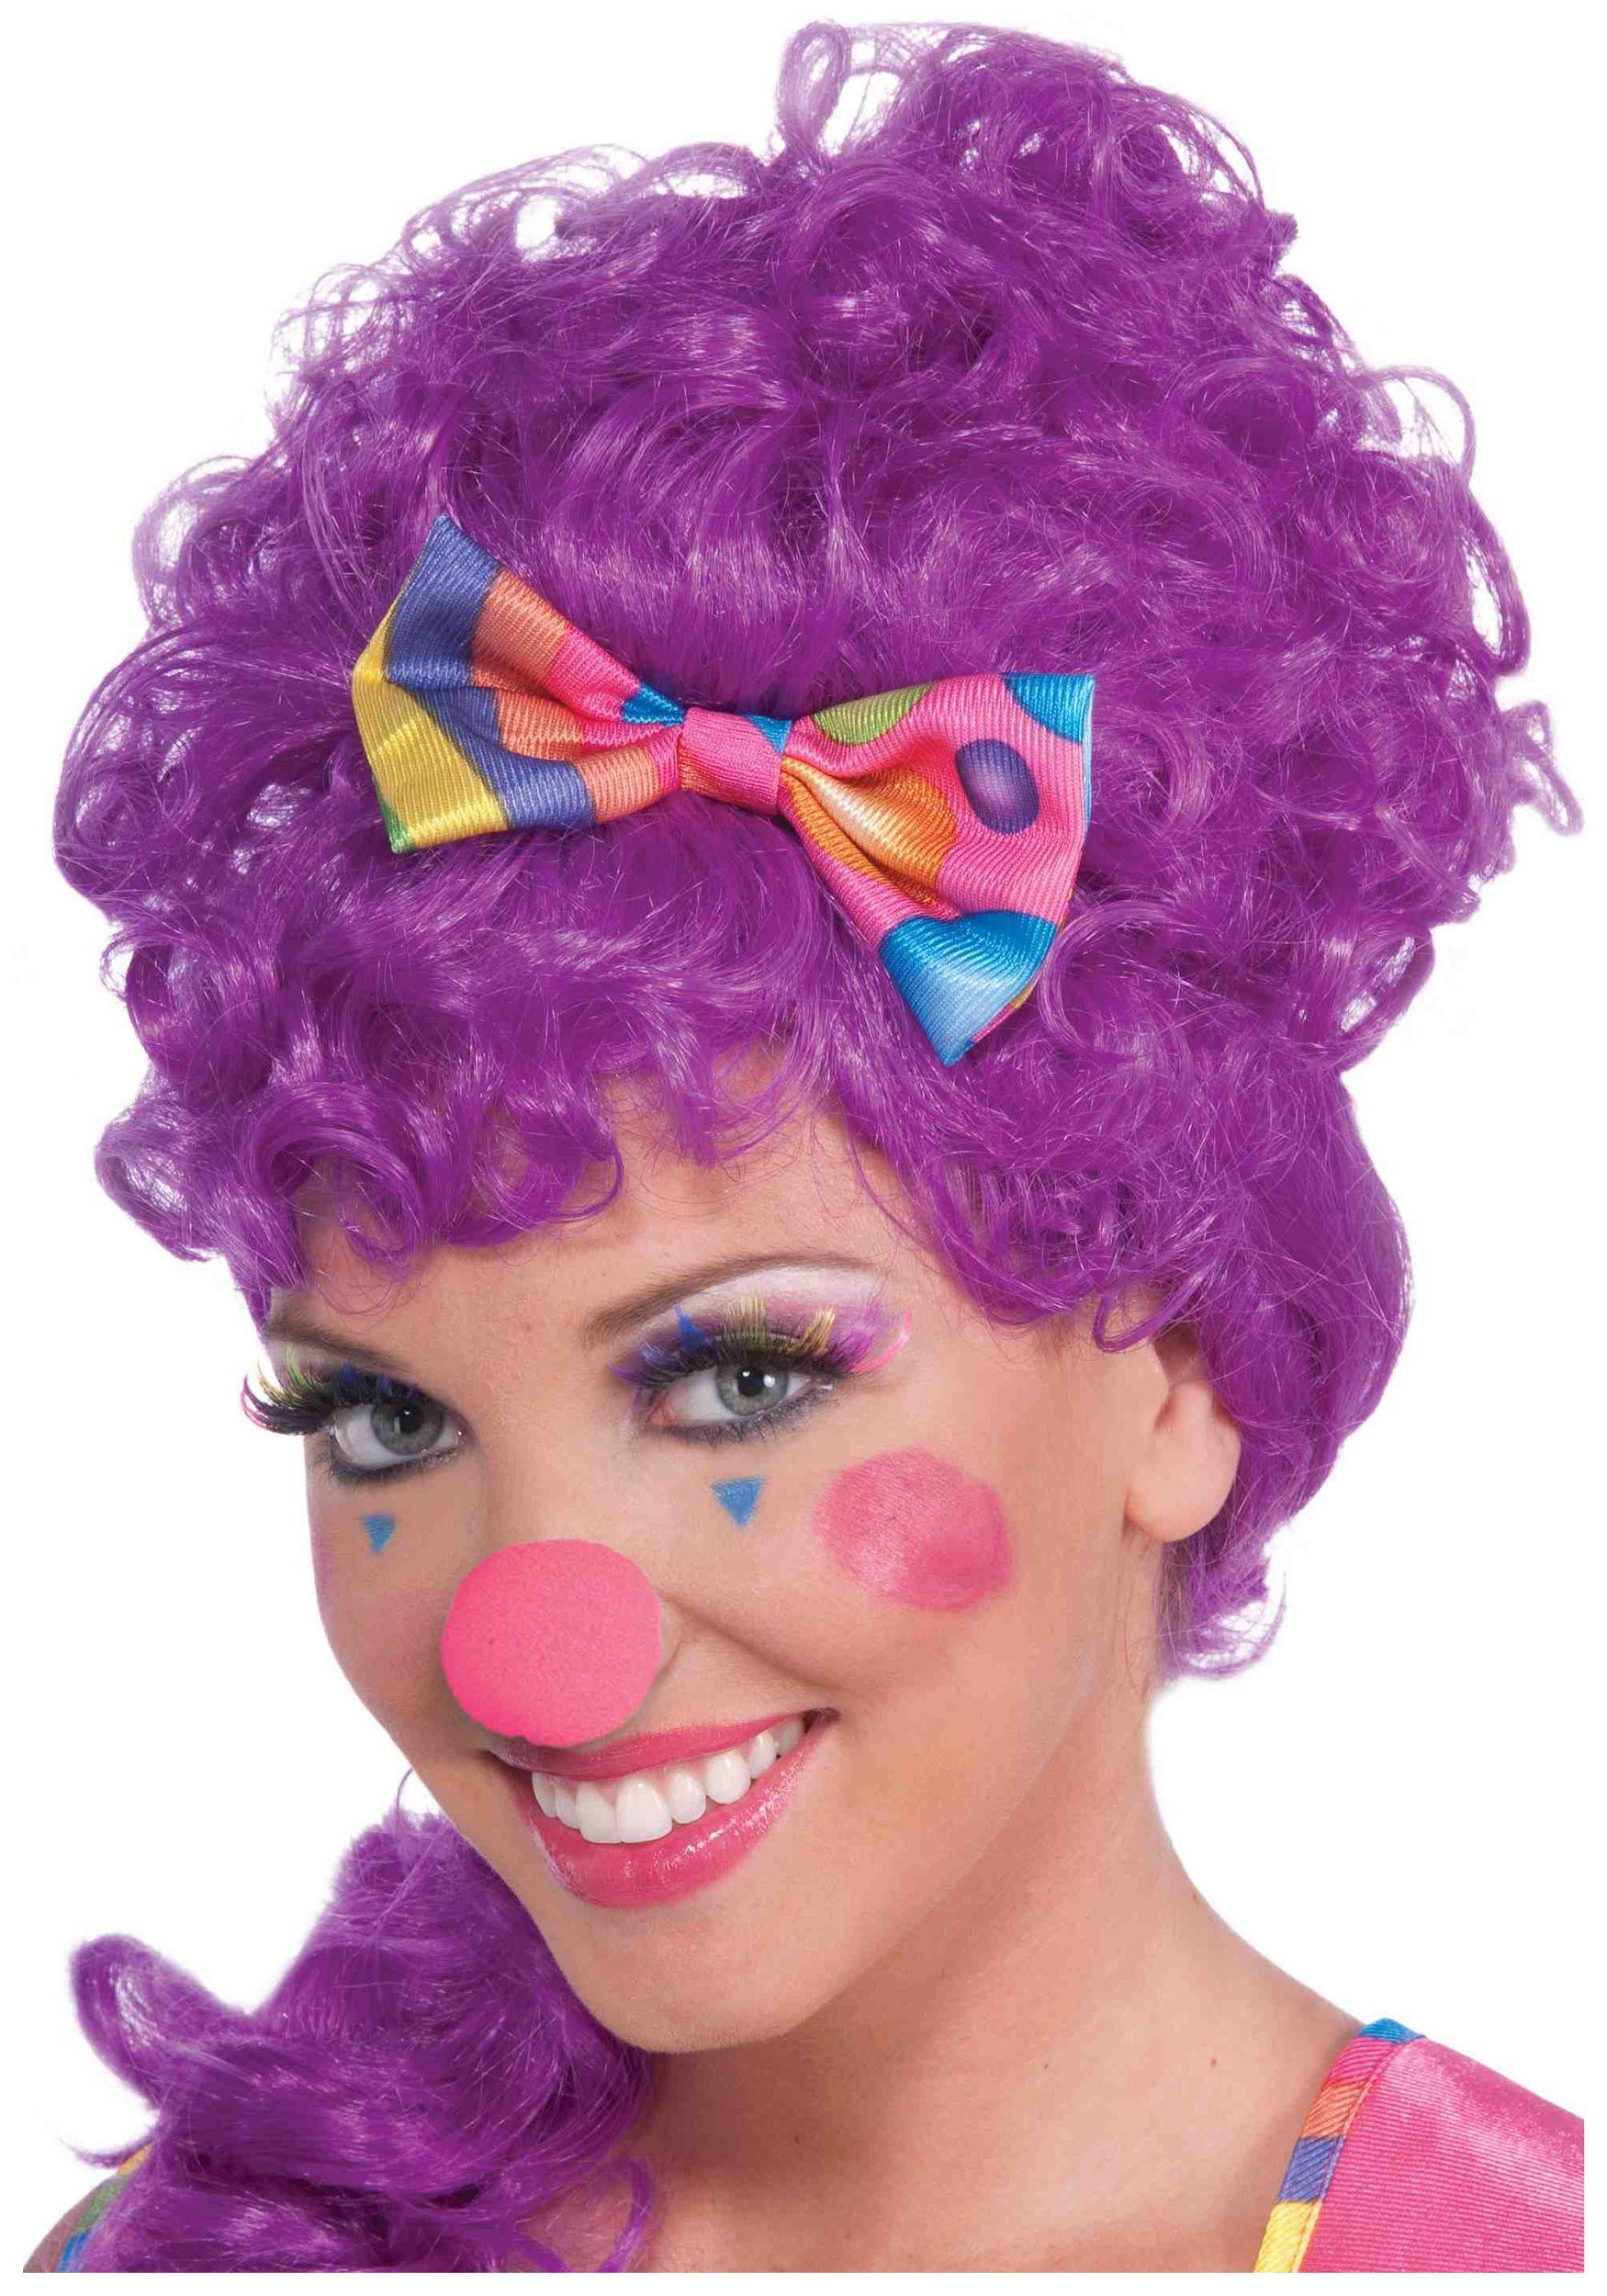 Pink Clown Nose Female clown, Clown makeup and Makeup